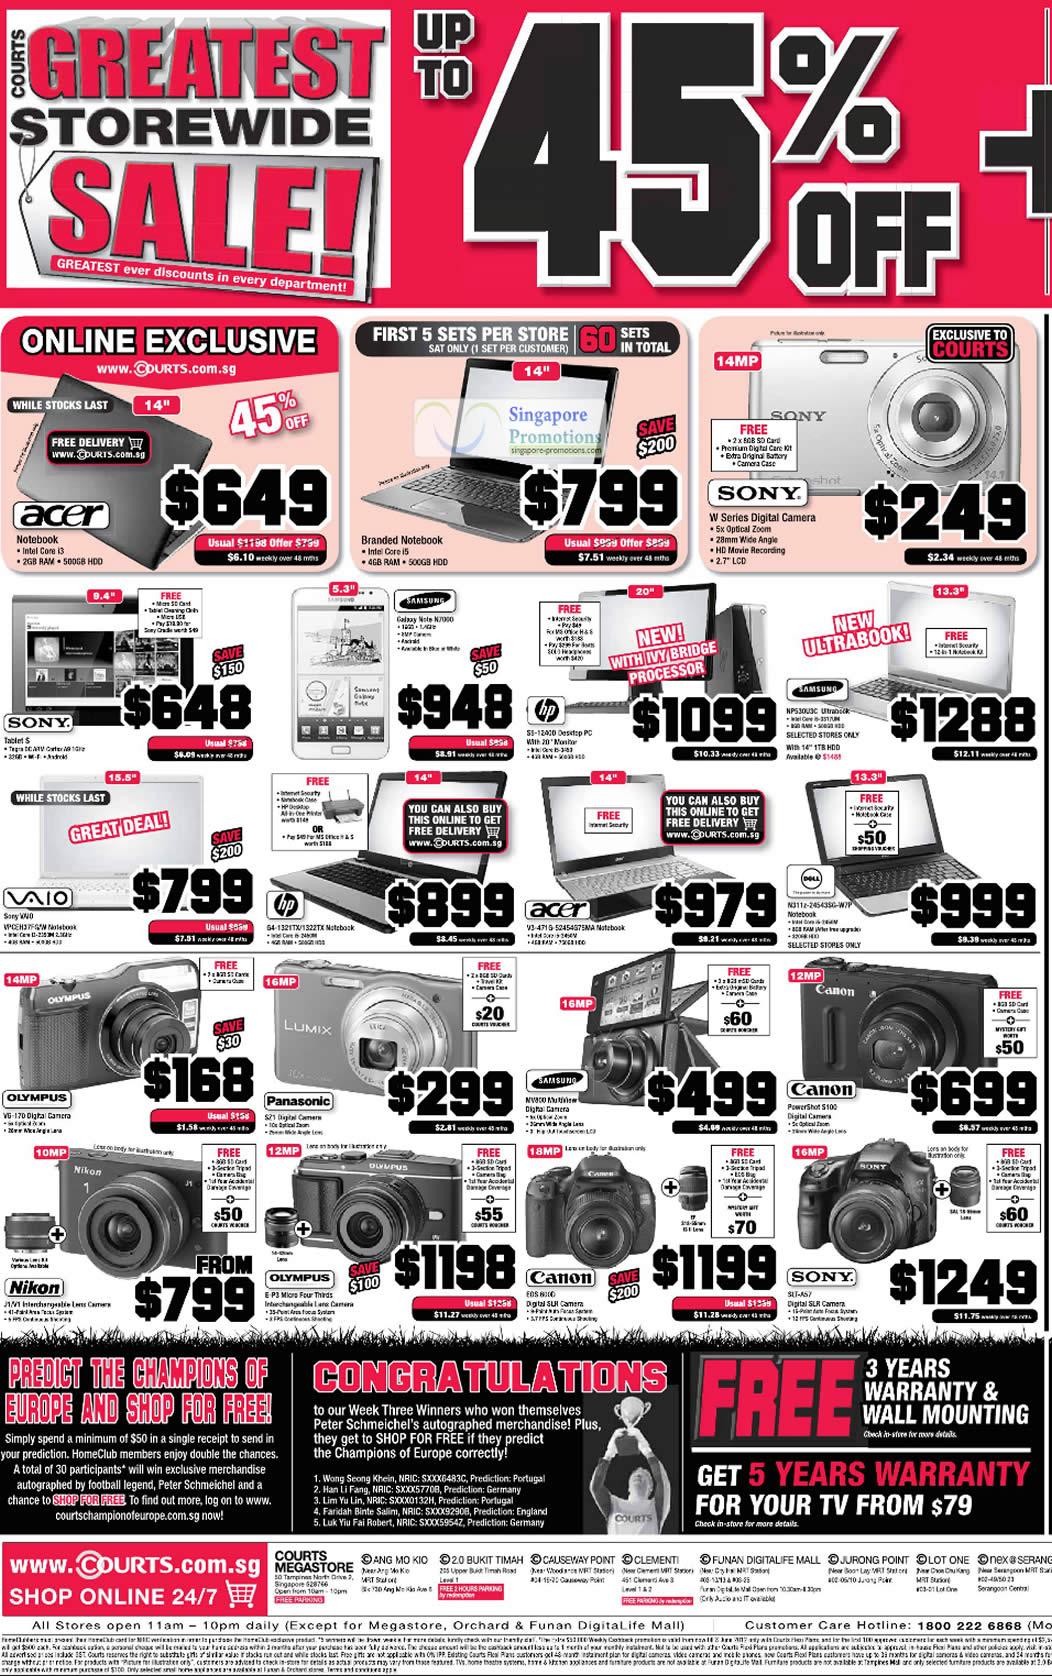 Notebooks, Digital Cameras, Acer, Sony, HP, Samsung, Dell, Canon, Panasonic, Olympus, Nikon